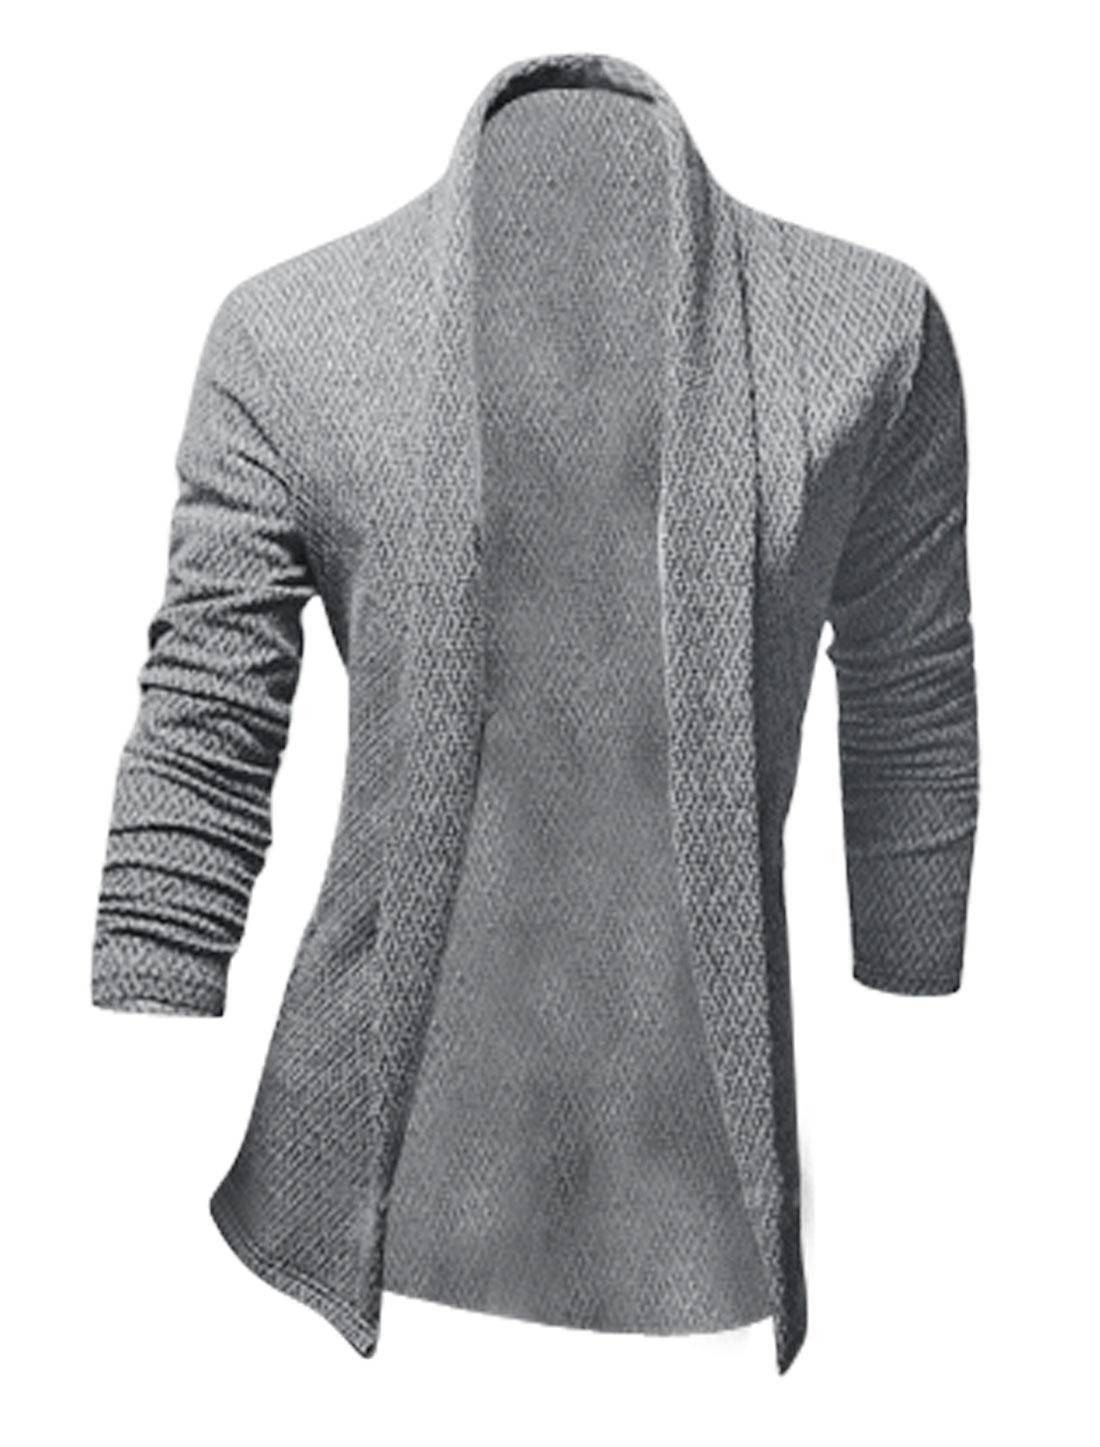 Men Long Sleeve Shawl Collar Slim Fit Fashion Cardigan Light Cool Gray M